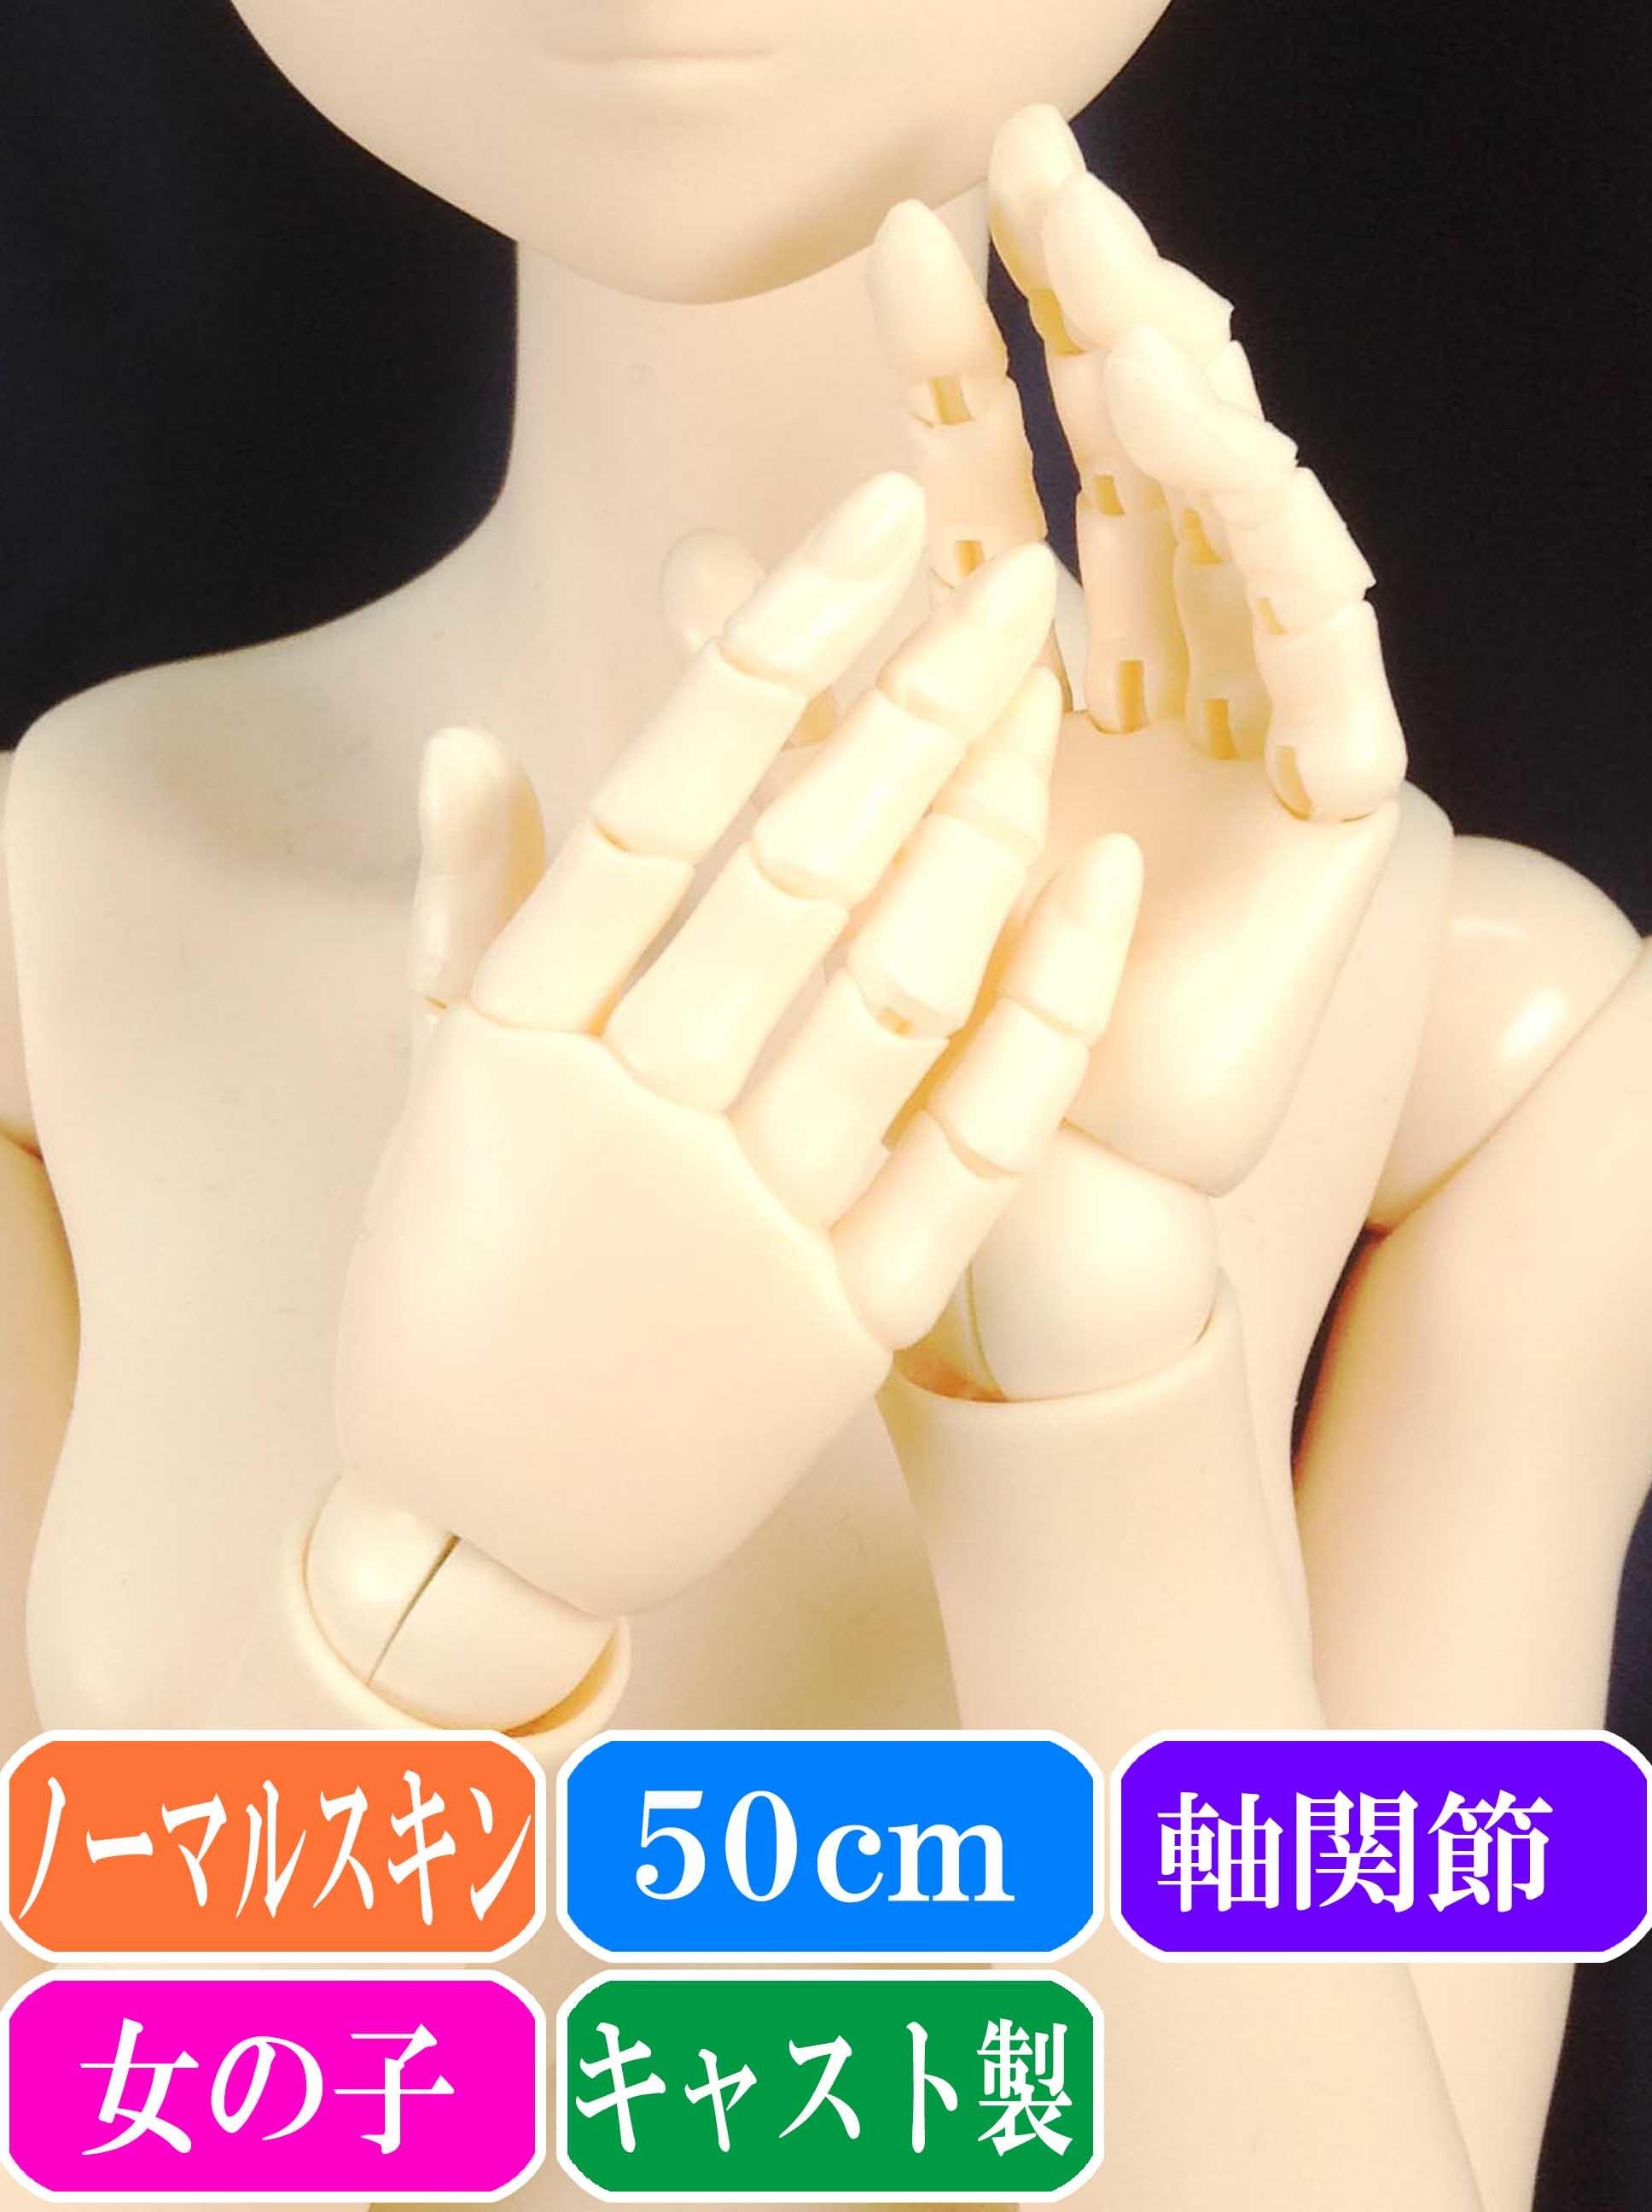 フル可動指(女)50cm01